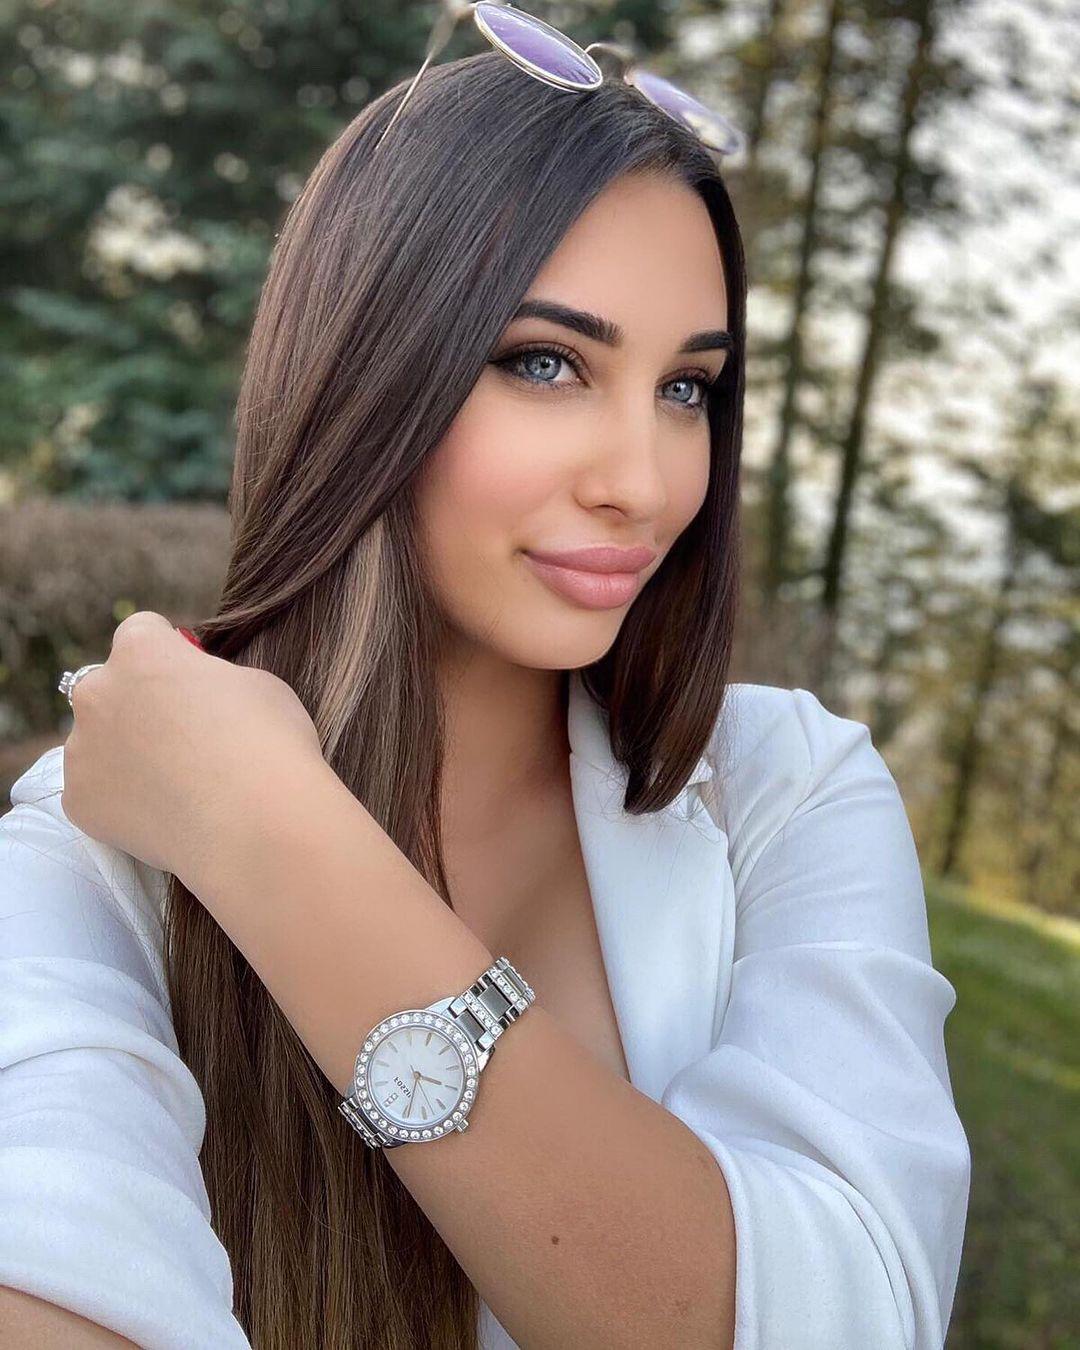 Diana-Mihajlovic-Wallpapers-Insta-Fit-Bio-19